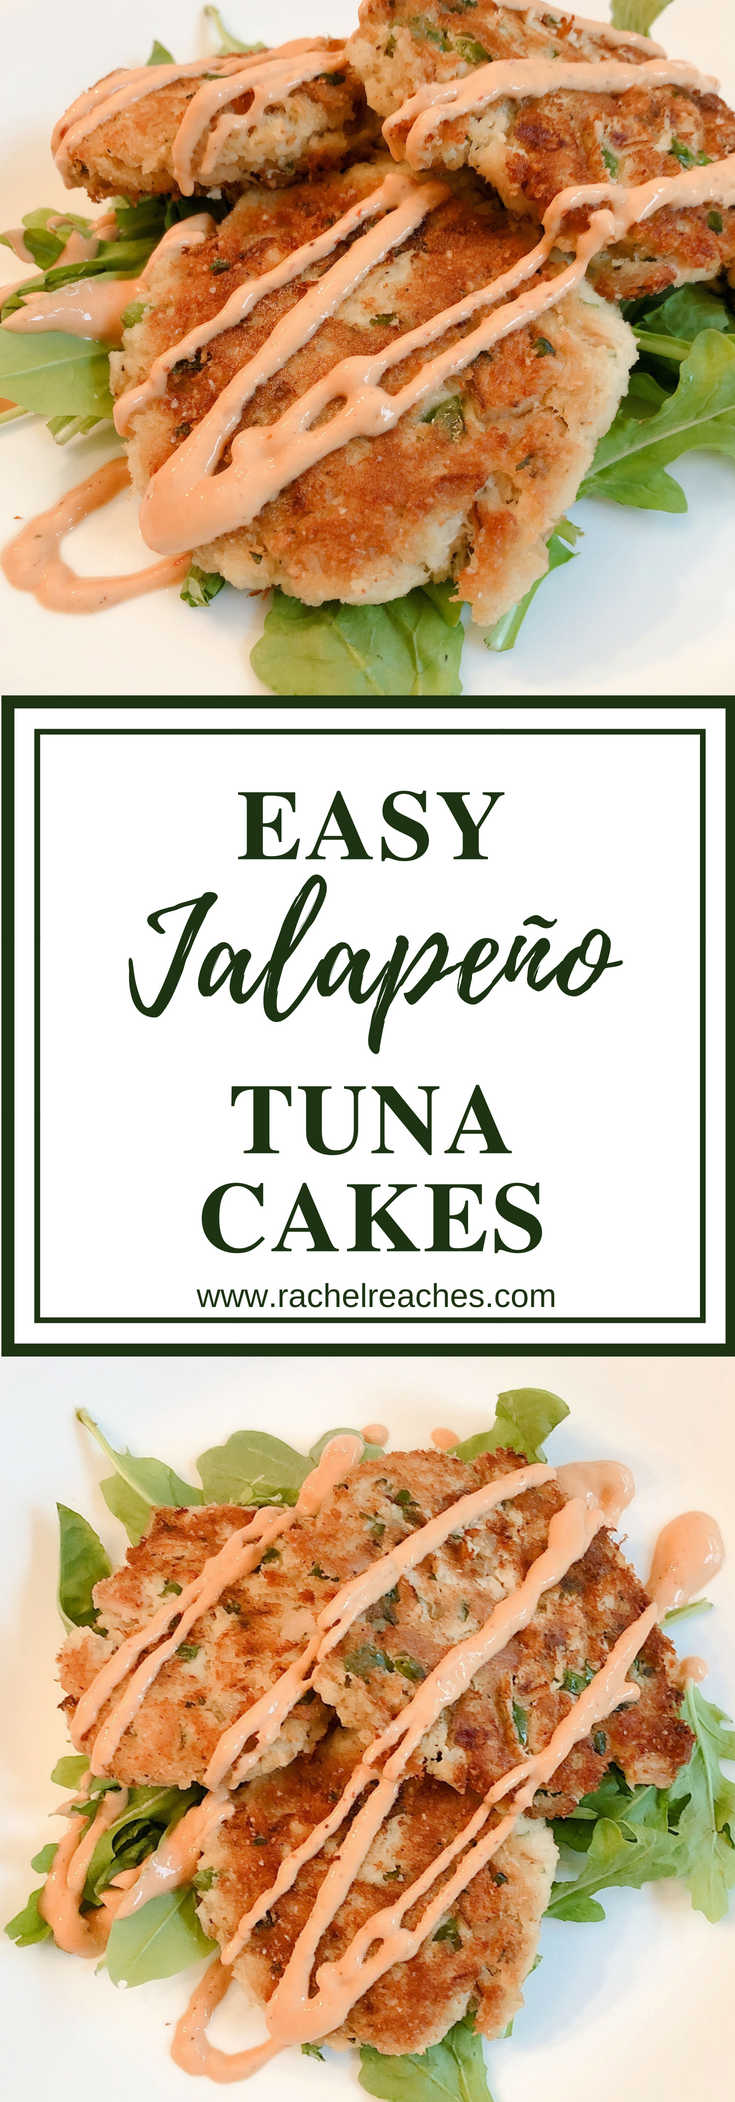 Jalapeno Tuna Cakes Pin - Healthy Eating.png